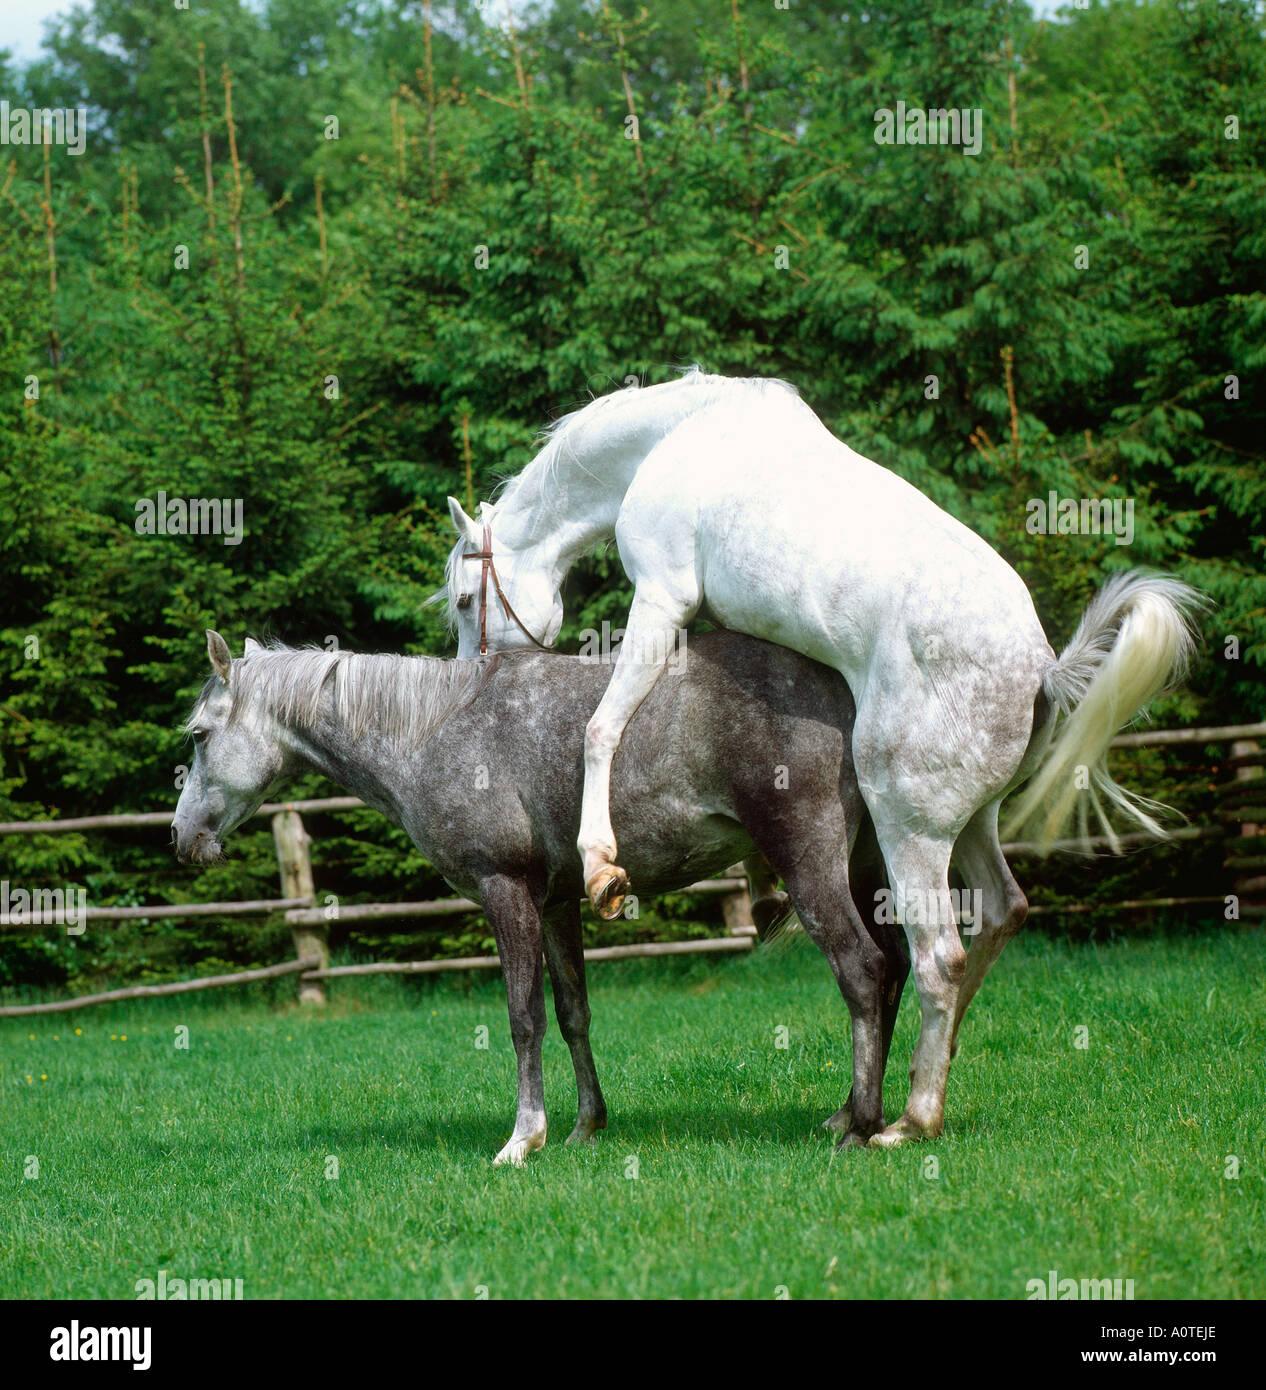 Horses Mating Stock Photos & Horses Mating Stock Images ...